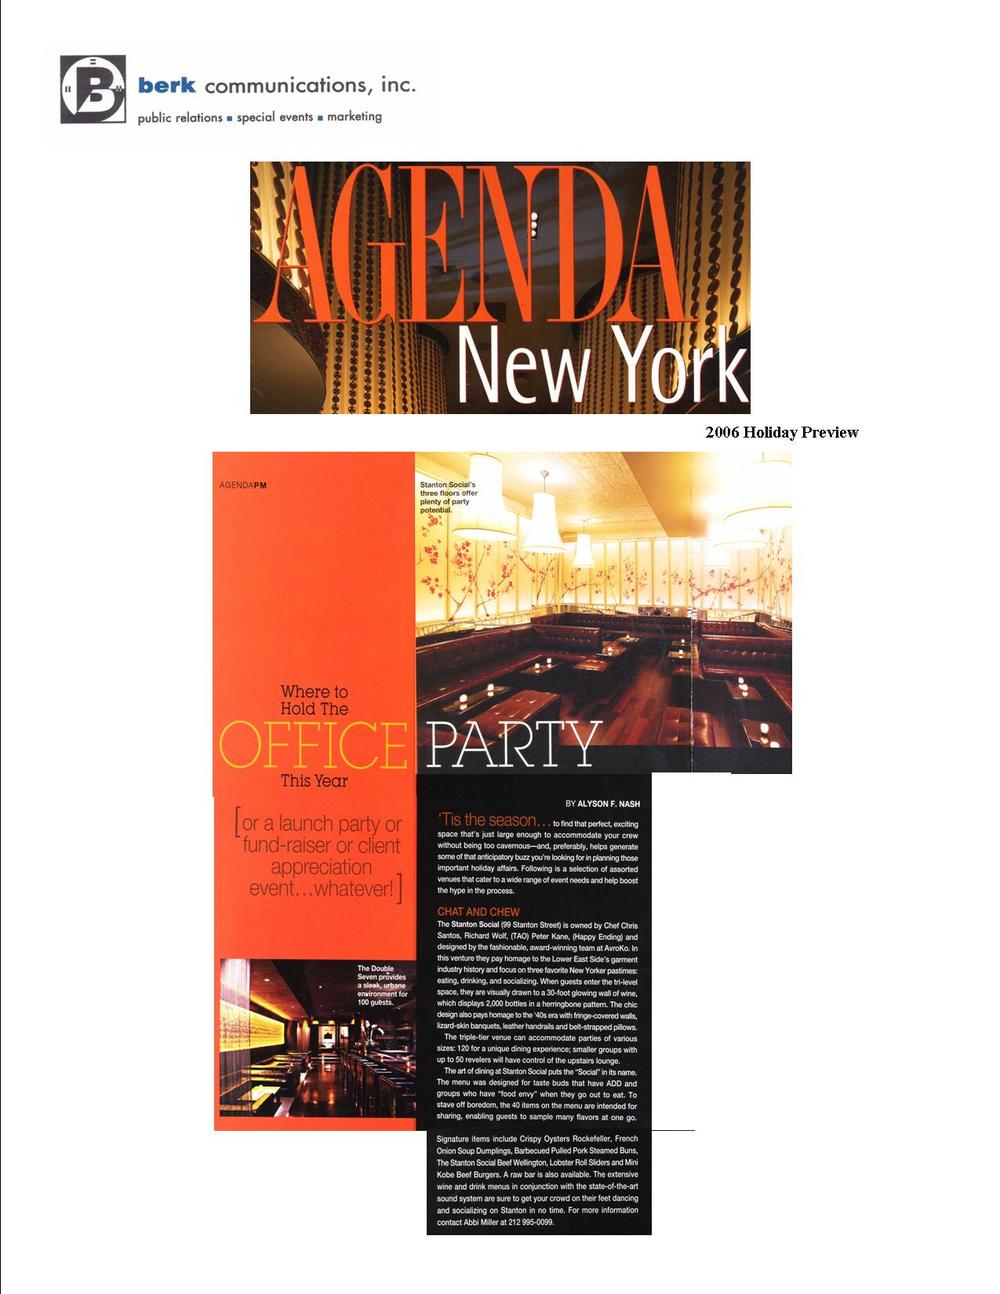 Agenda New York